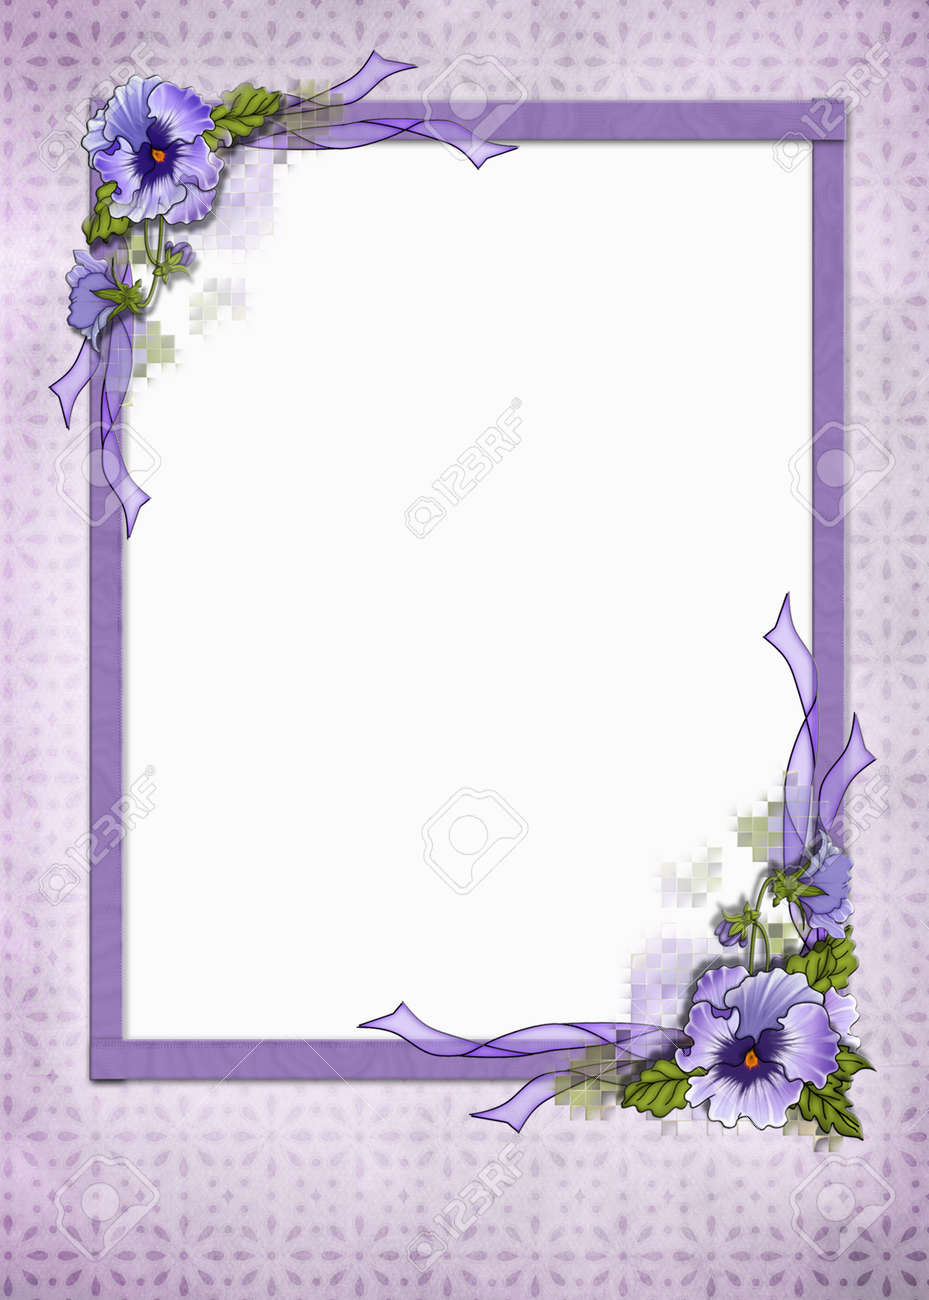 Fancy pansy frame on eyelet background Stock Photo - 13366376